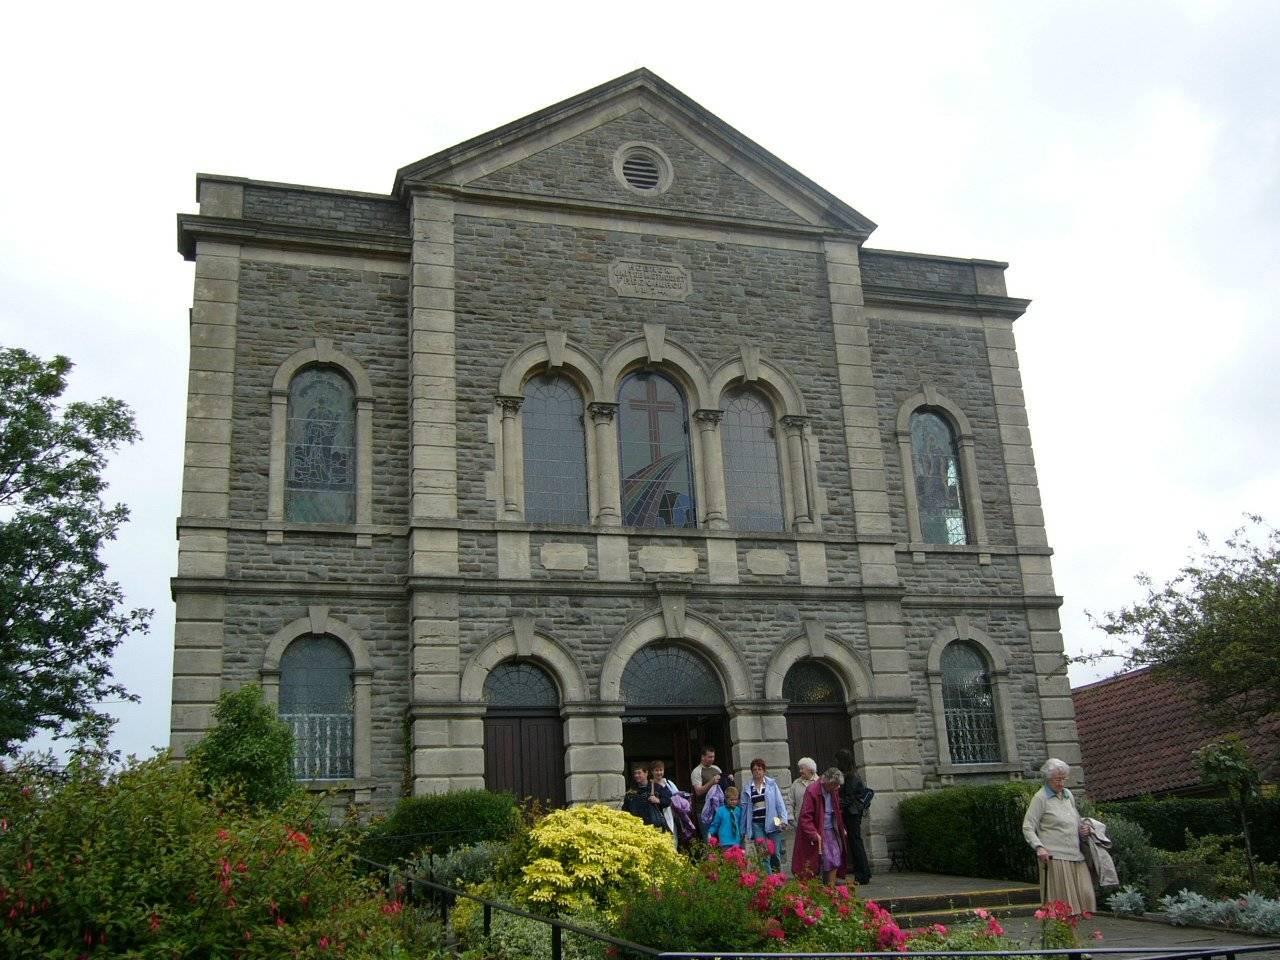 Staple Hill Methodist Church, 131 High Street, Staple Hill, Bristol, S Gloucs, BS16 5HQ, UK